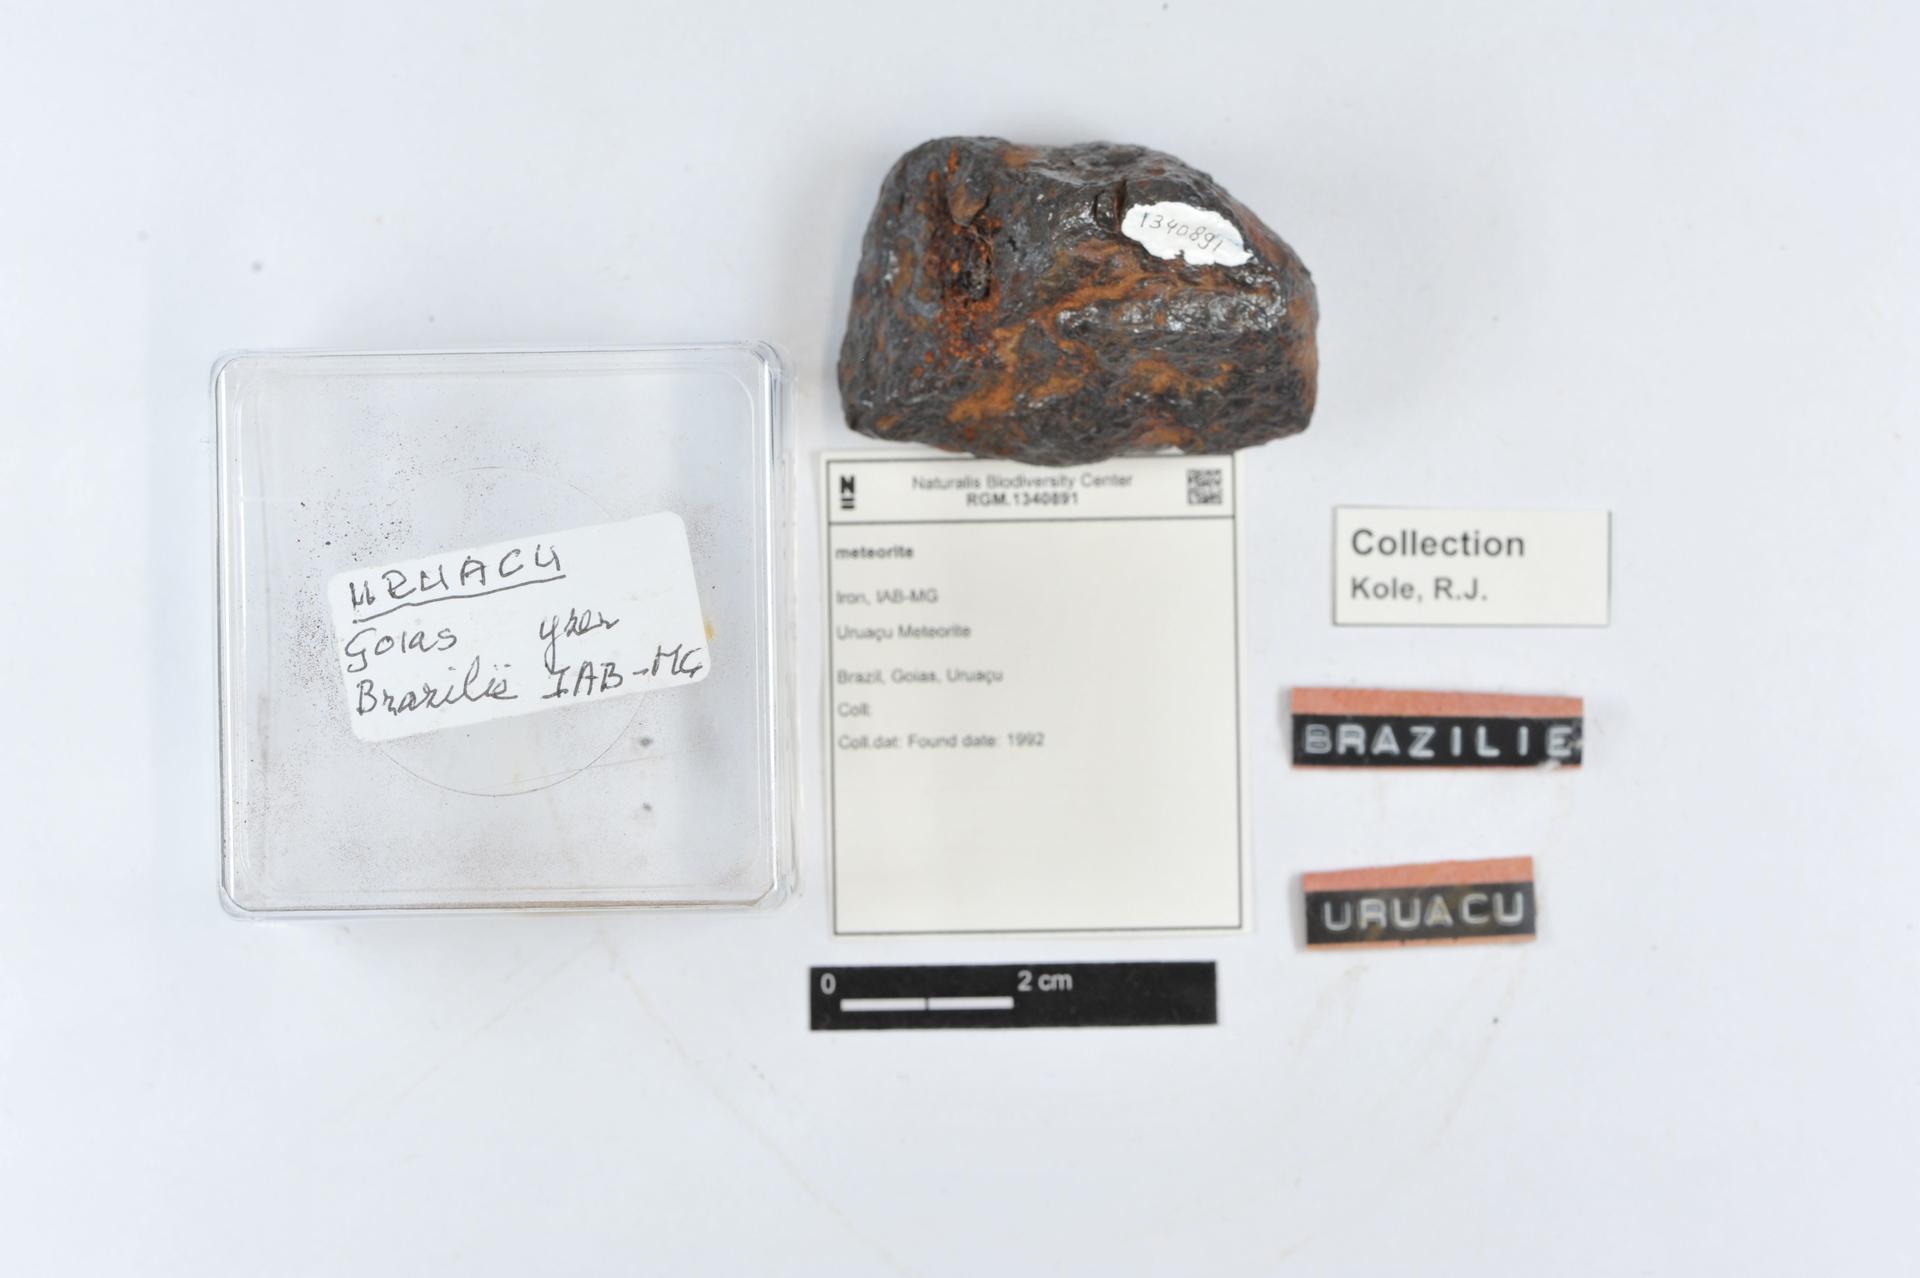 RGM.1340891 | Iron, IAB-MG